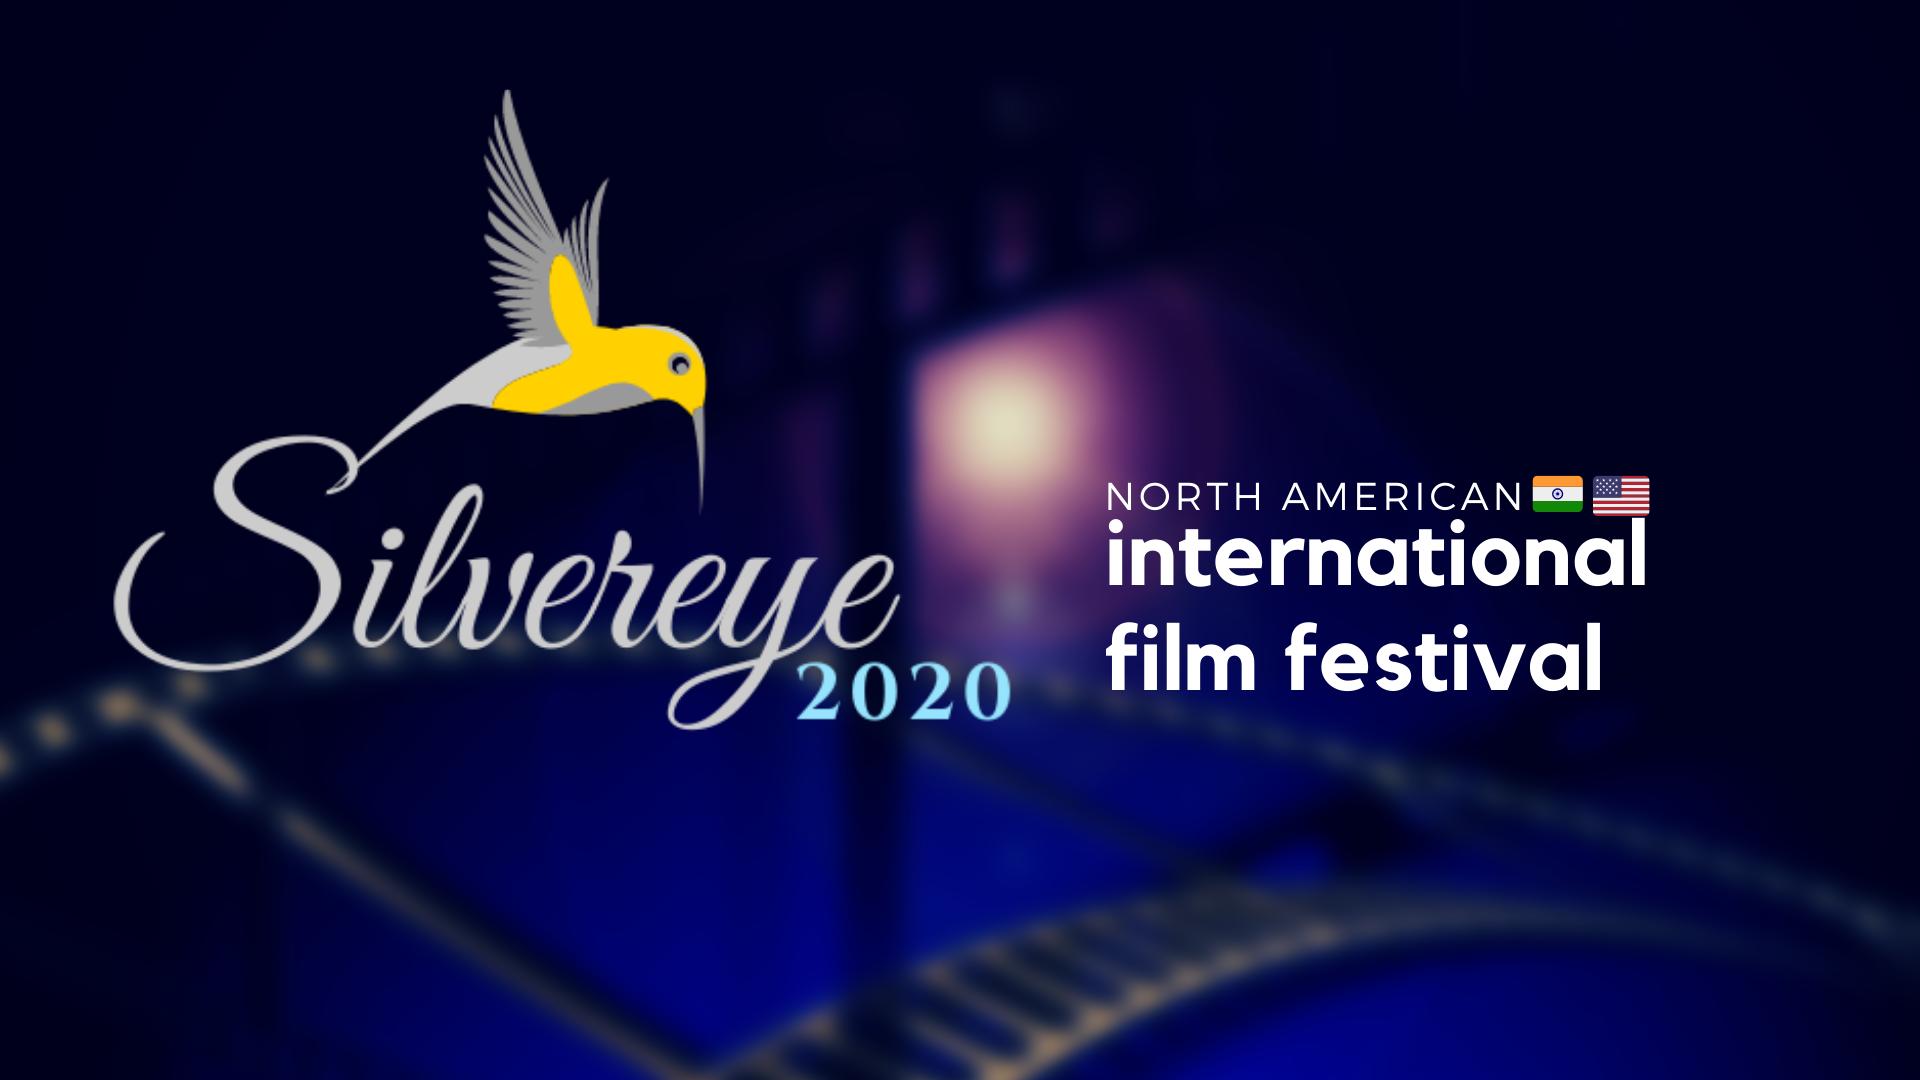 silvereye-international-film-festival